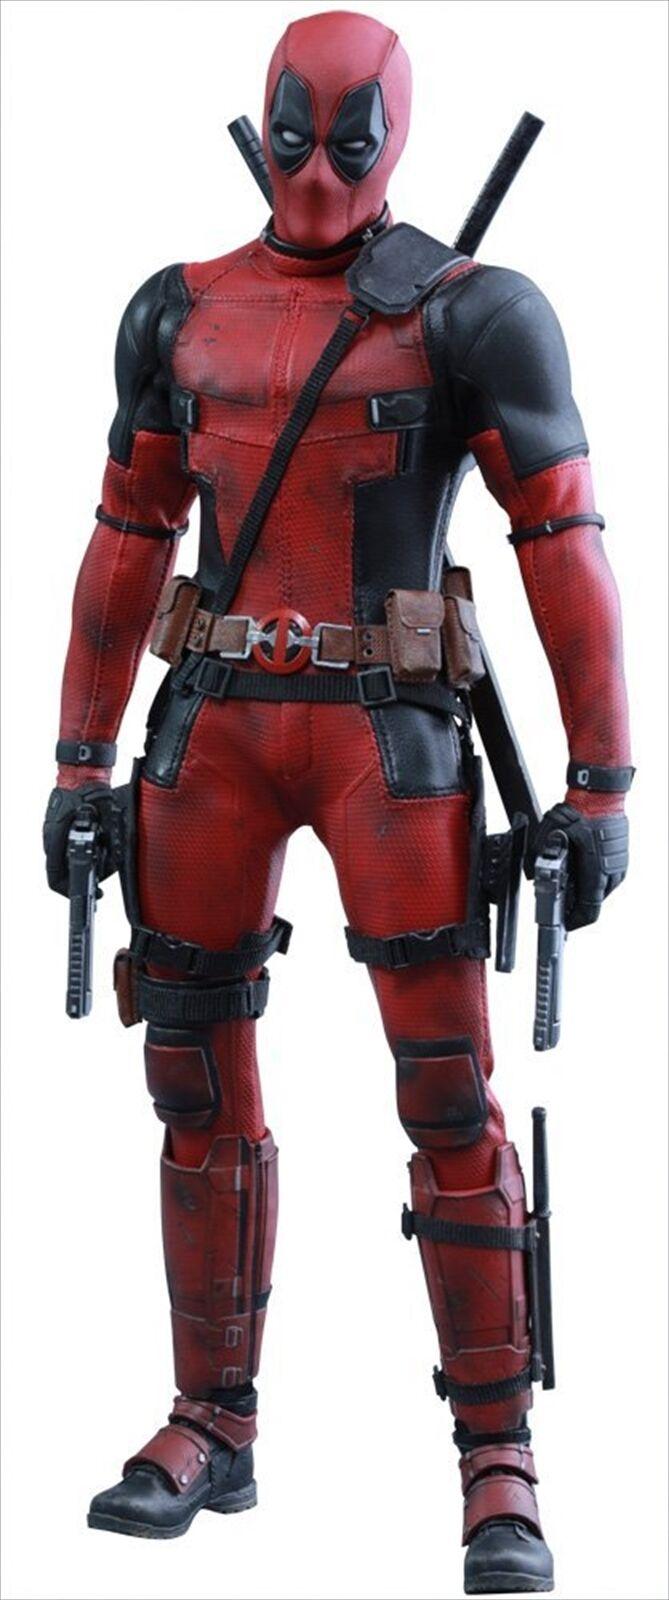 Hot Toys Marvel Comics Movie Masterpiece Deadpool 1/6 Scale Action Action Action Figure 396181